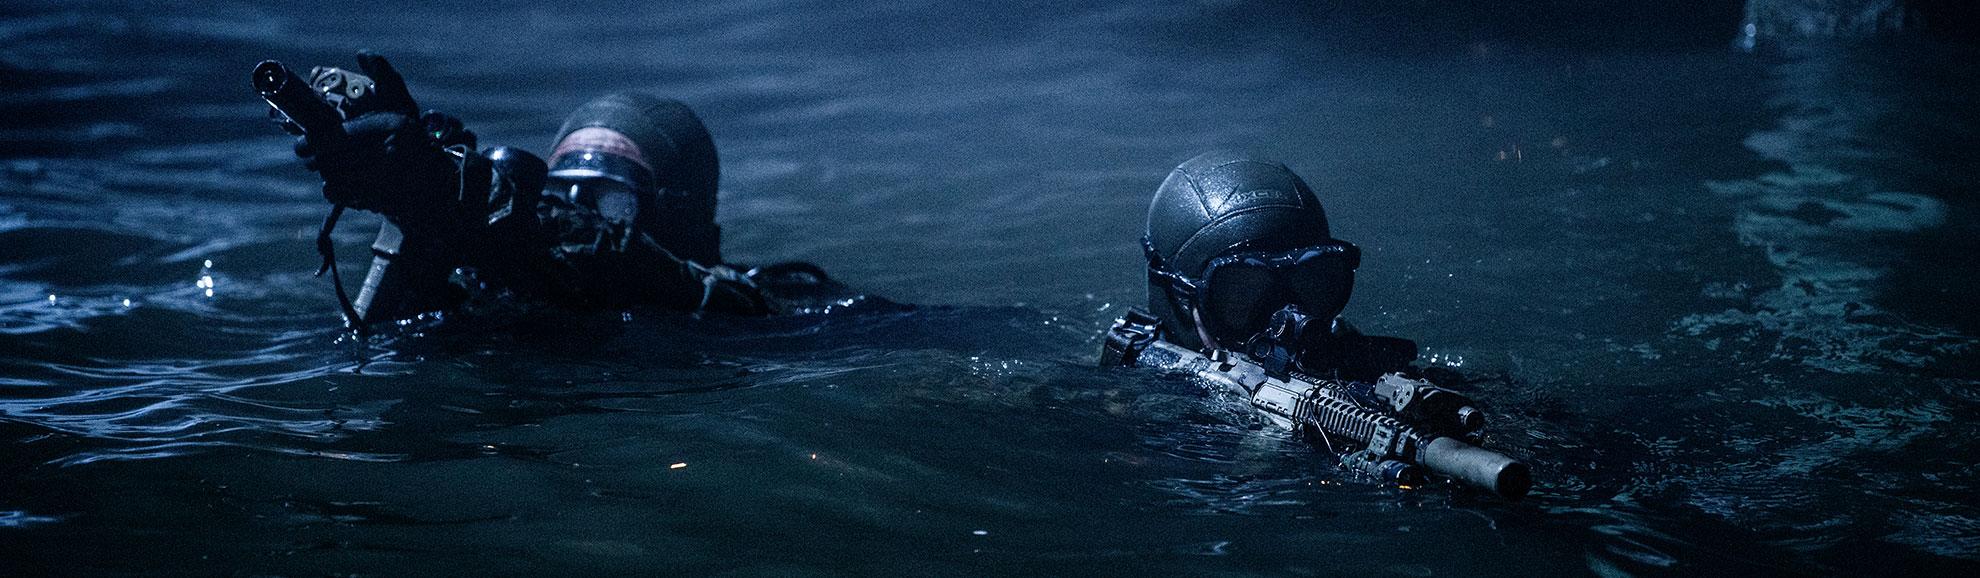 Elite naval forces use SureFire suppressors